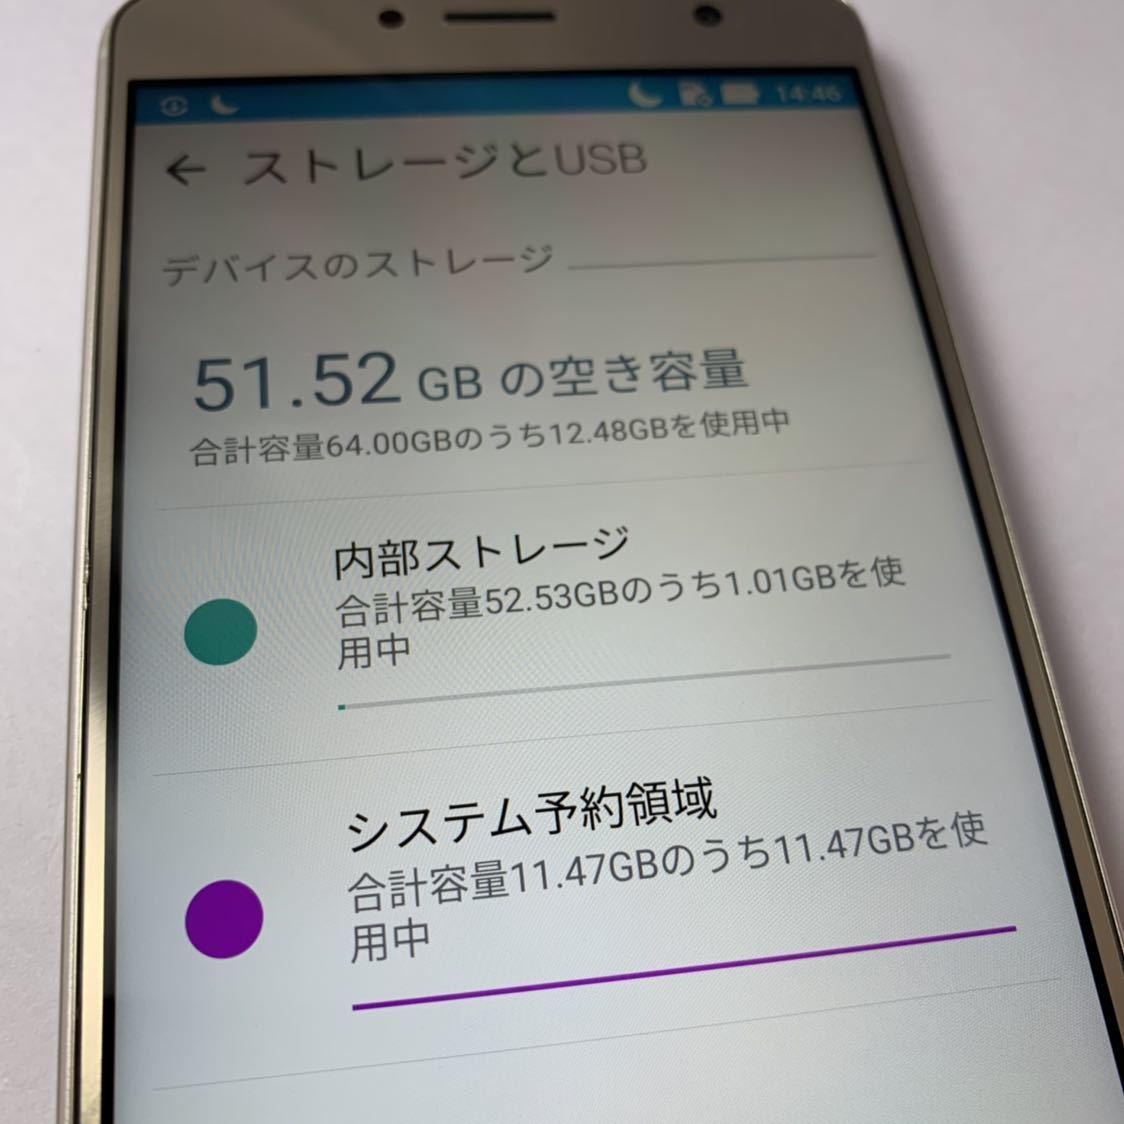 ASUS Zenfone 3 Deluxe 5.5 ZS550KL 64GB SIMフリー 本体 Z01FD ゴールド 海外版_画像9